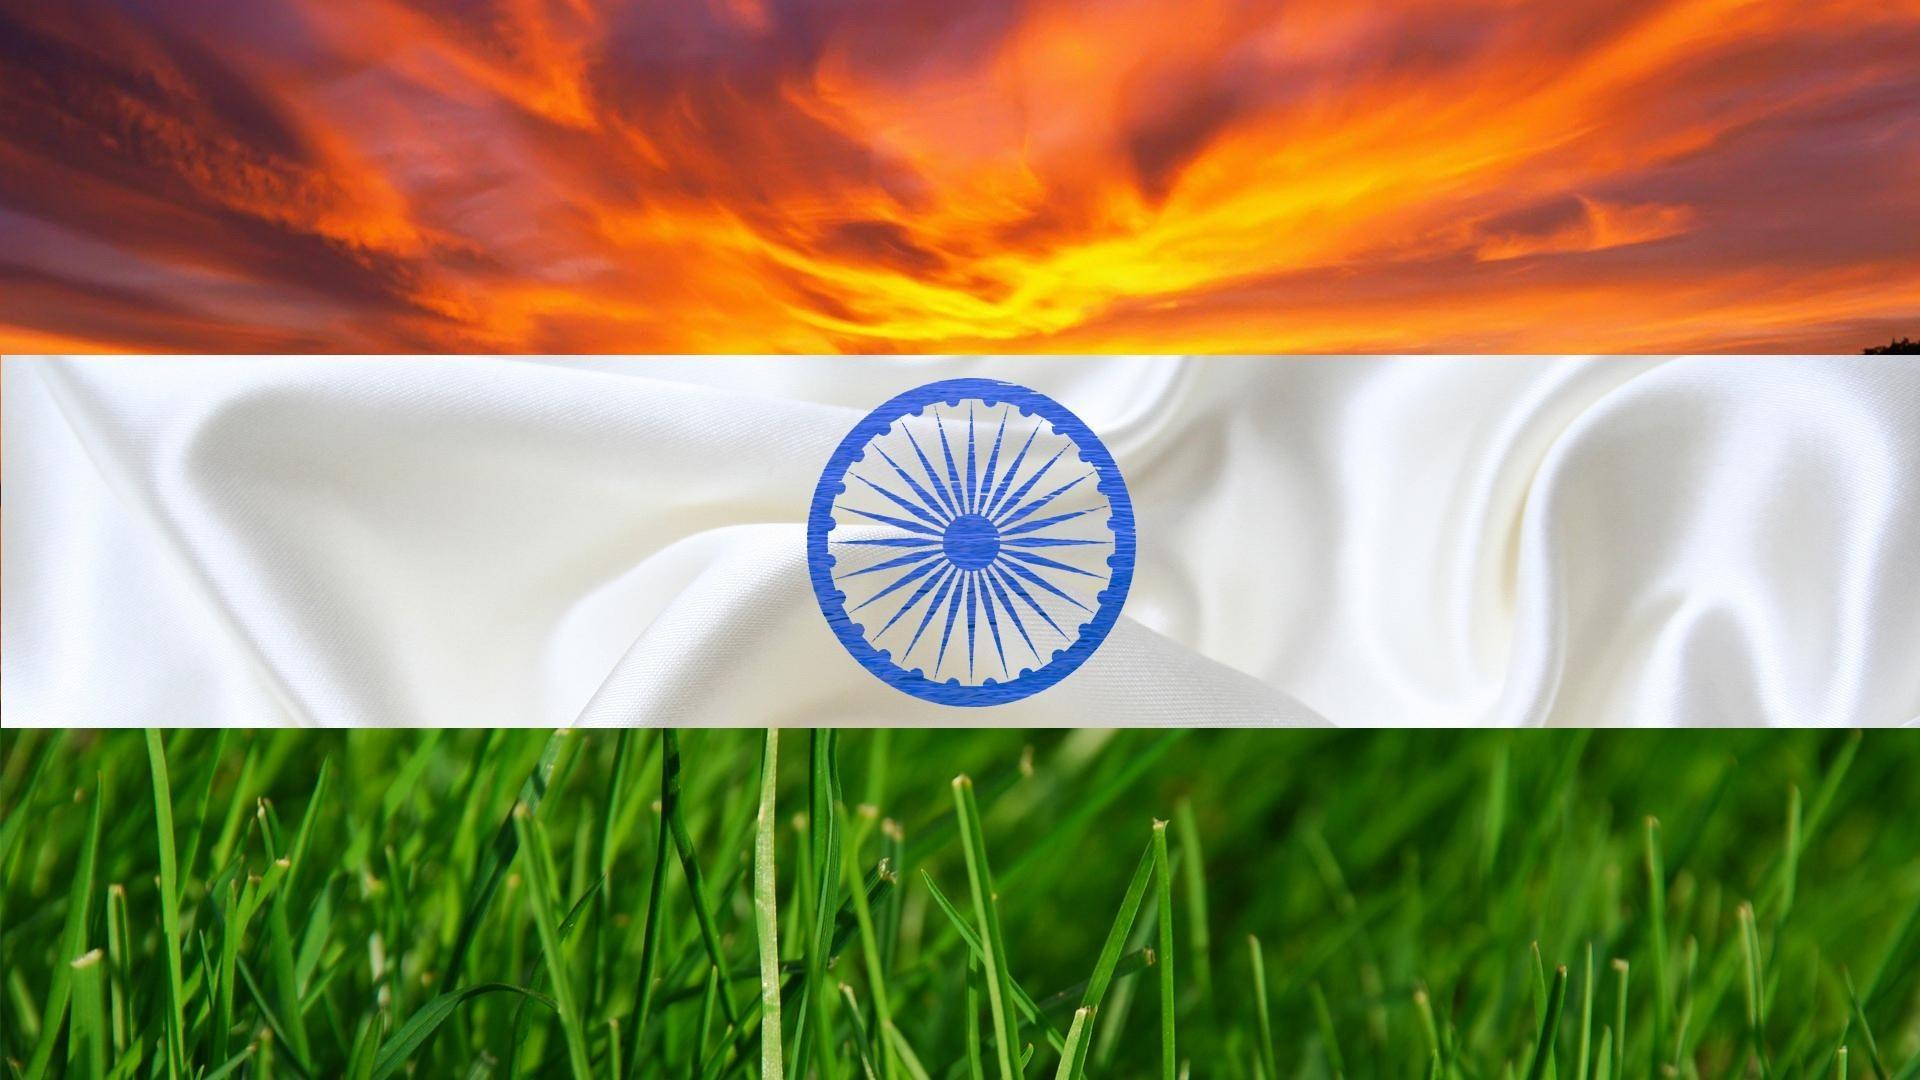 india 1080p free hd wallpaper 0026